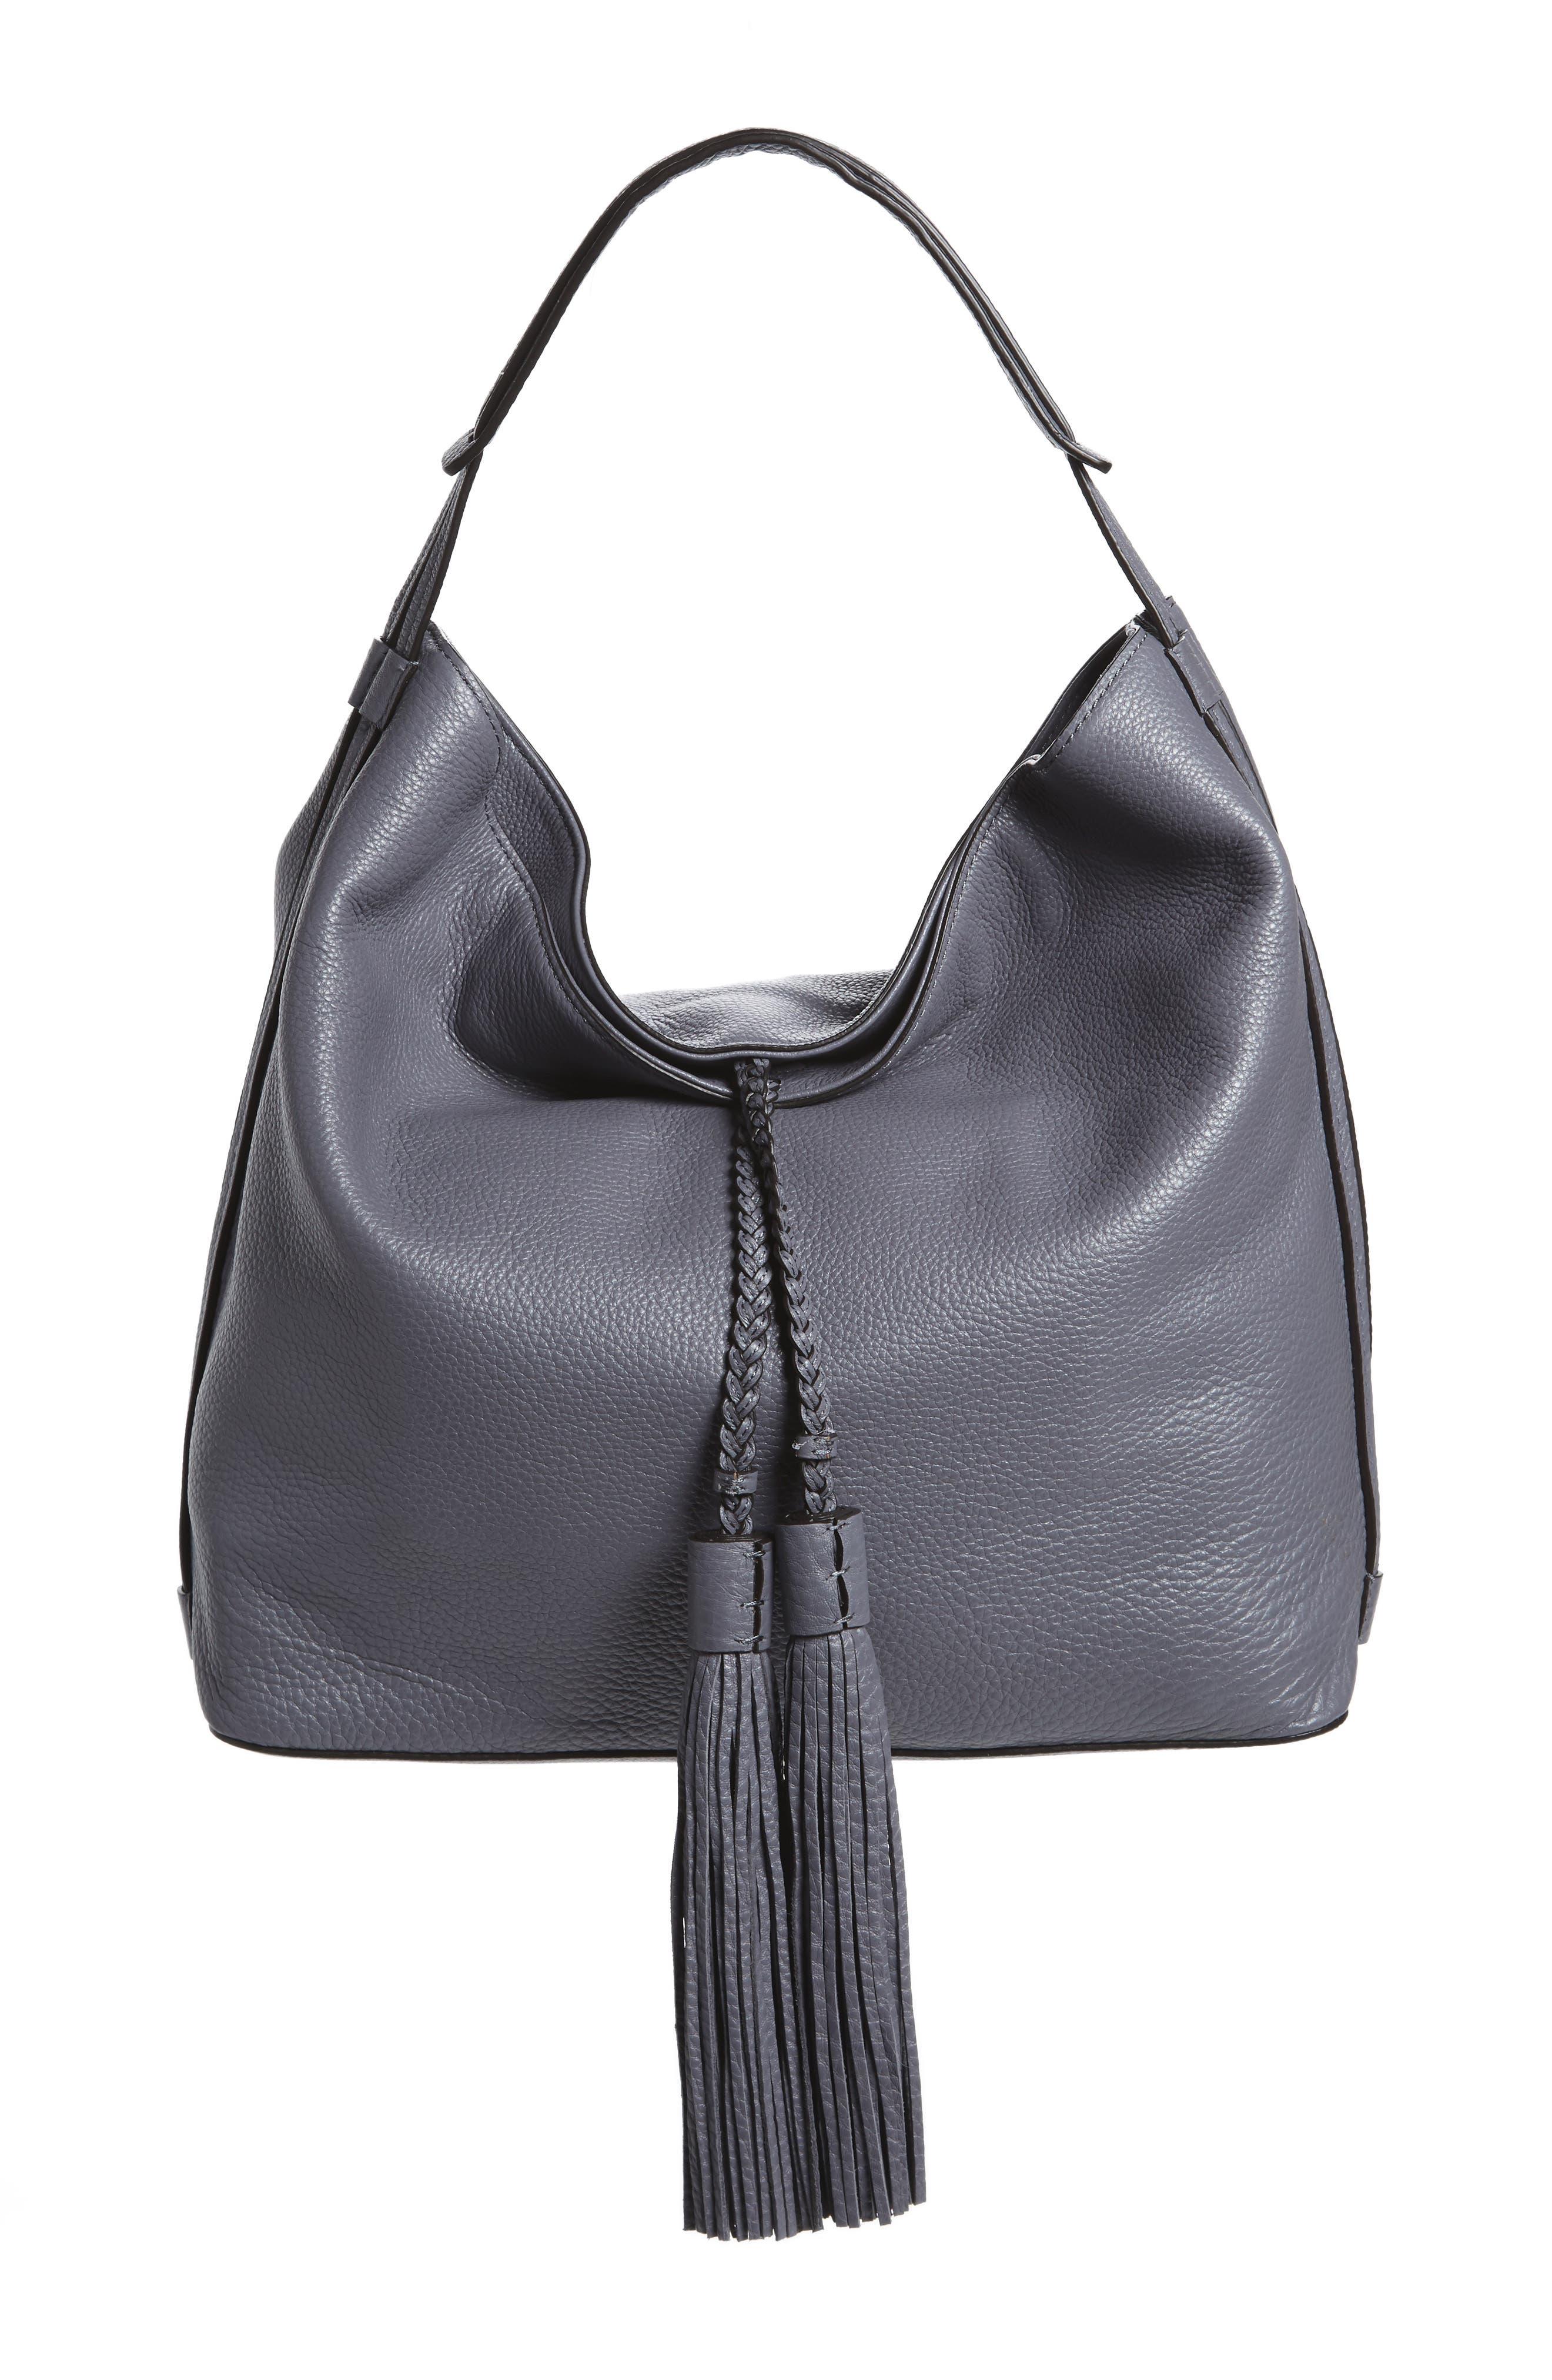 Alternate Image 1 Selected - Rebecca Minkoff Isobel Tassel Leather Hobo